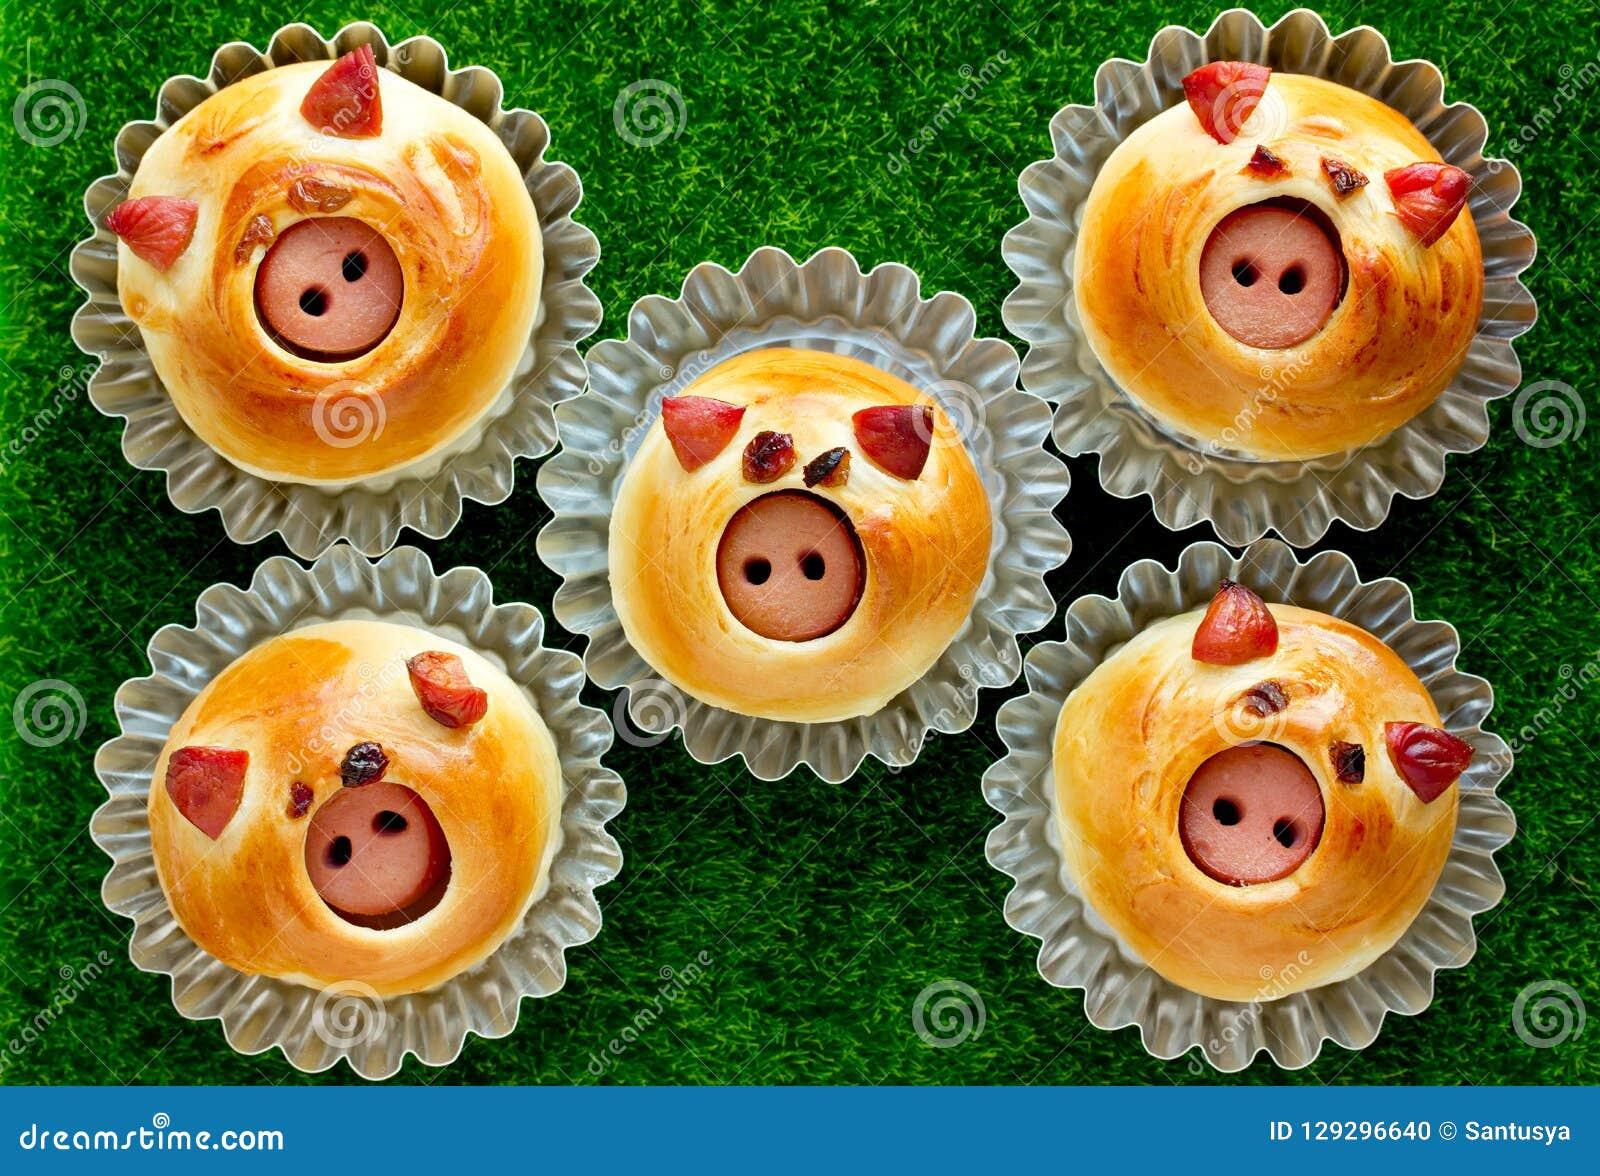 Sausage stuffed piglet buns, homemade burger buns shaped funny pigs faces